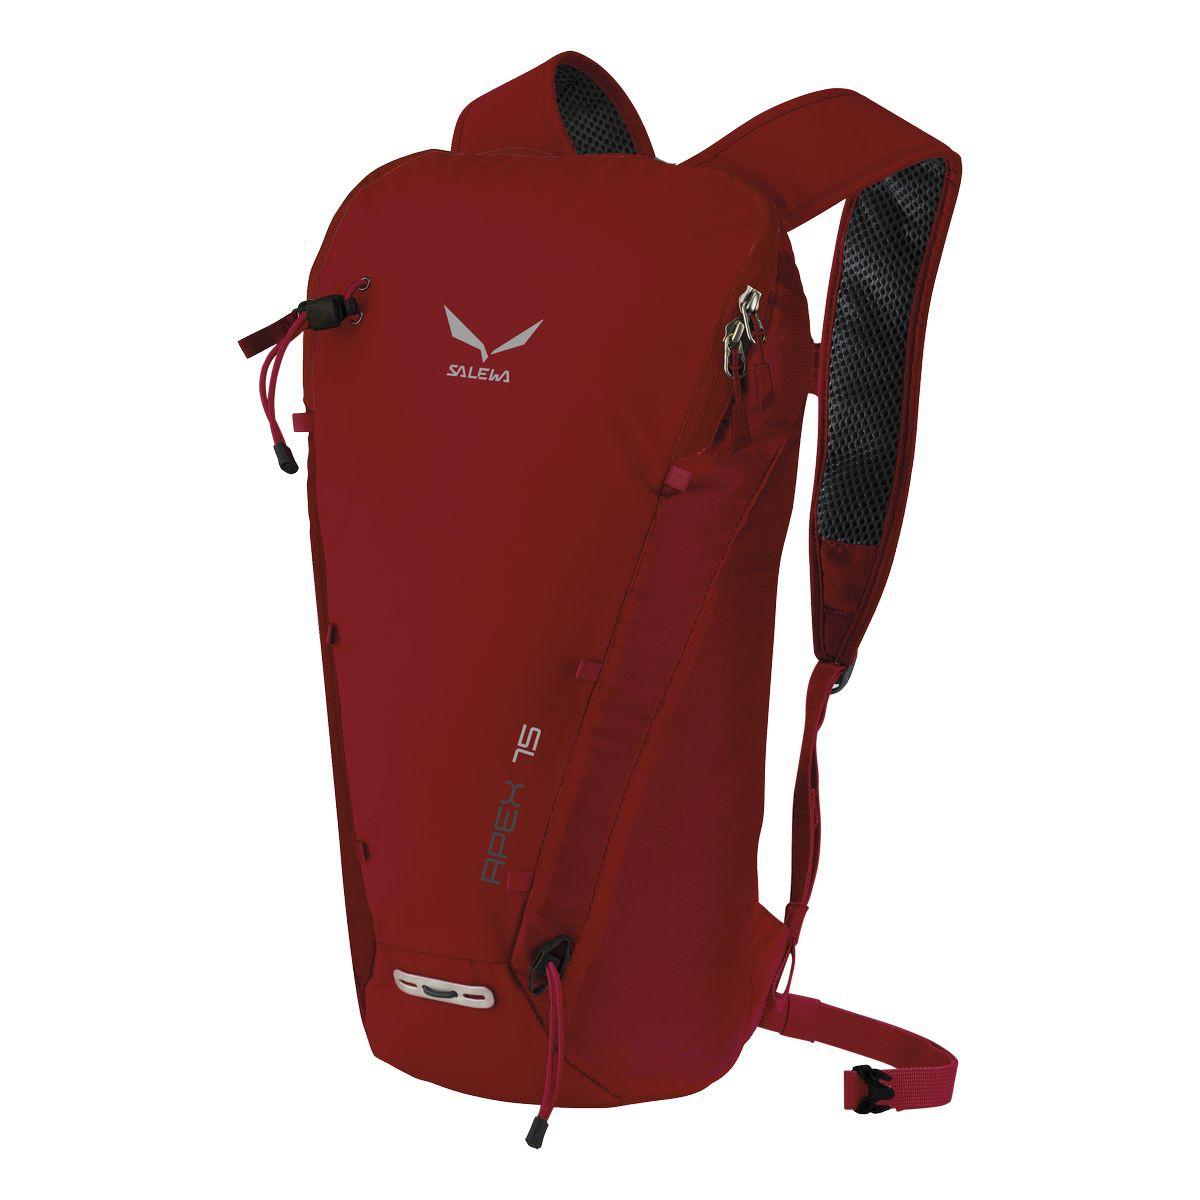 68e277332a36 Рюкзак туристический Salewa 2016 Apex 15 Pompei Red , производитель ...